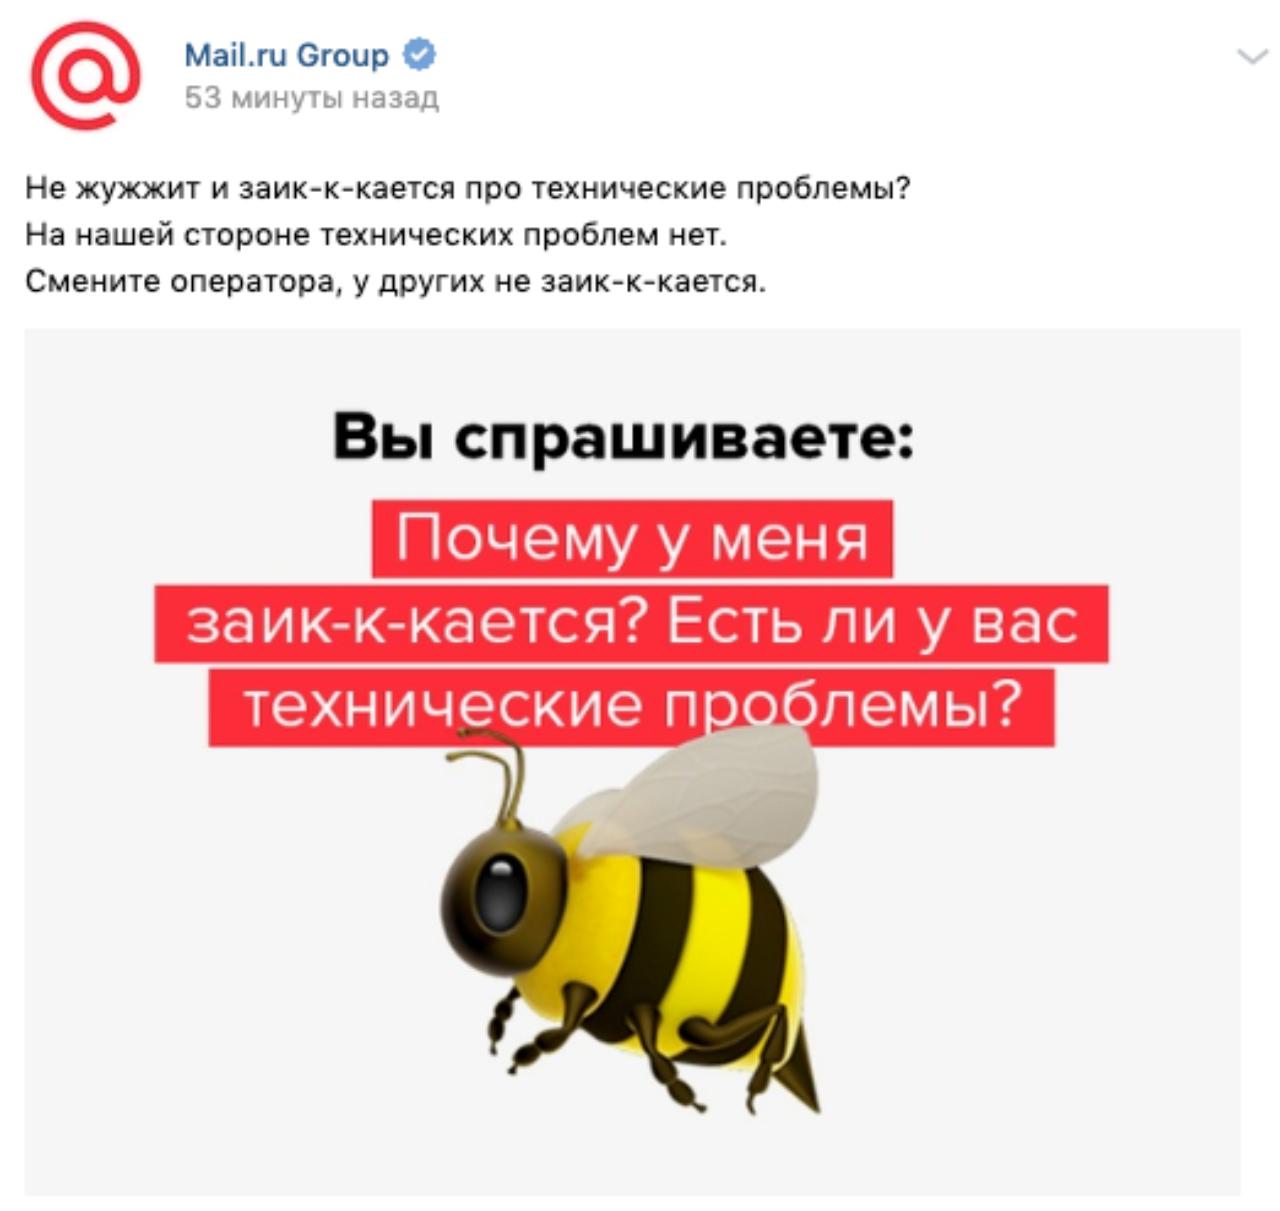 4ecdaabea «Билайн» и Mail.ru Group обвинили друг друга в проблемах абонентов с  доступом к «ВКонтакте» и другим сервисам